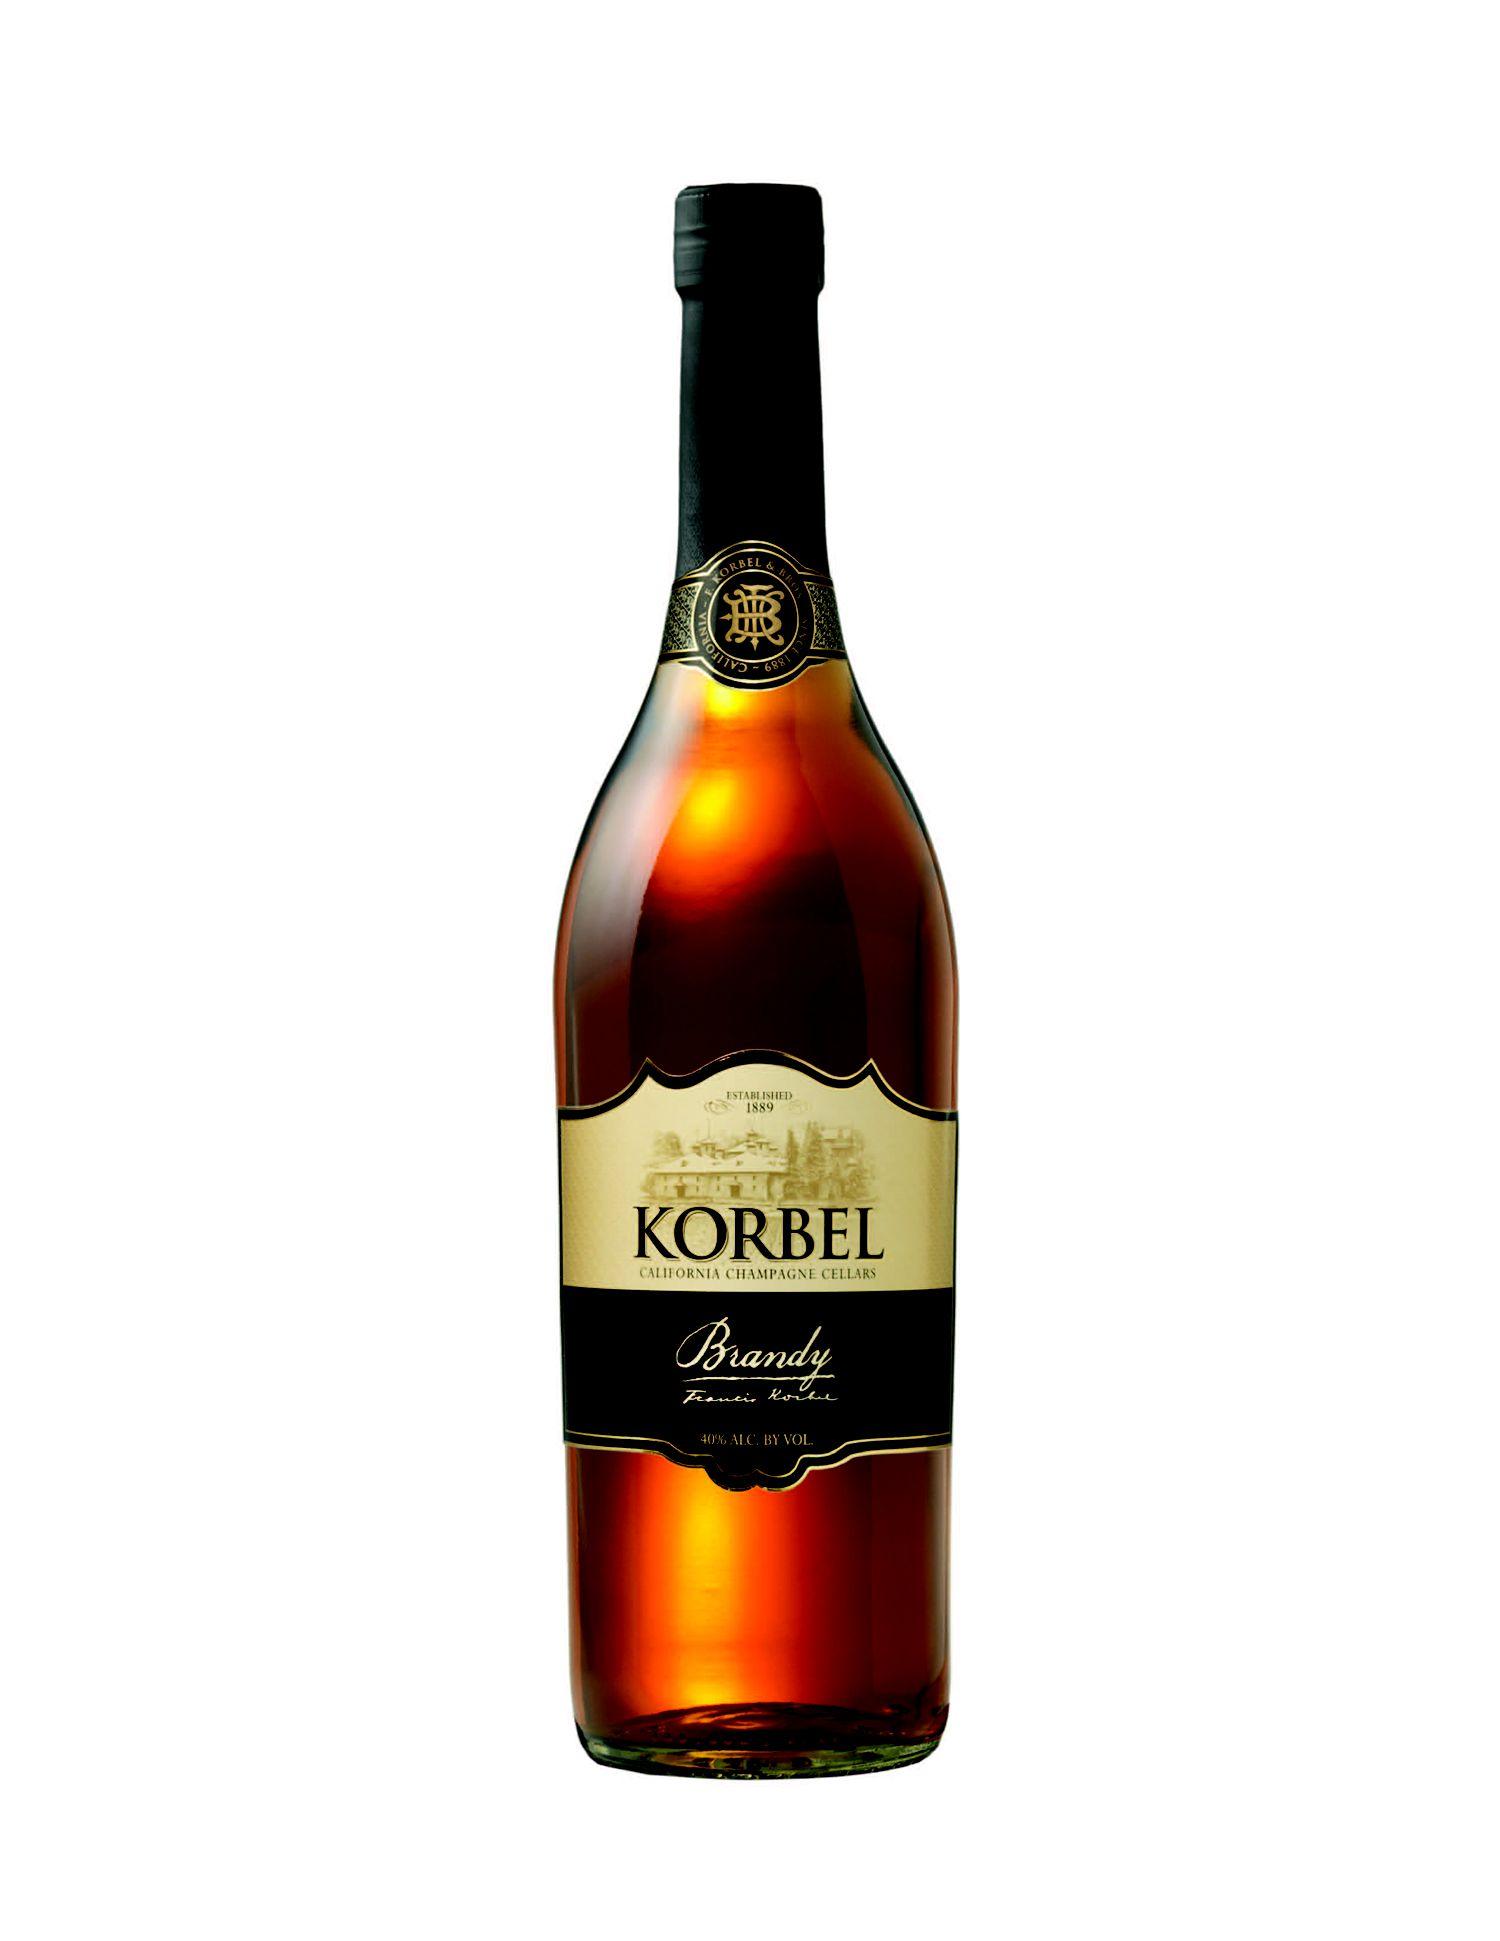 Korbel California Brandy Liquor Review